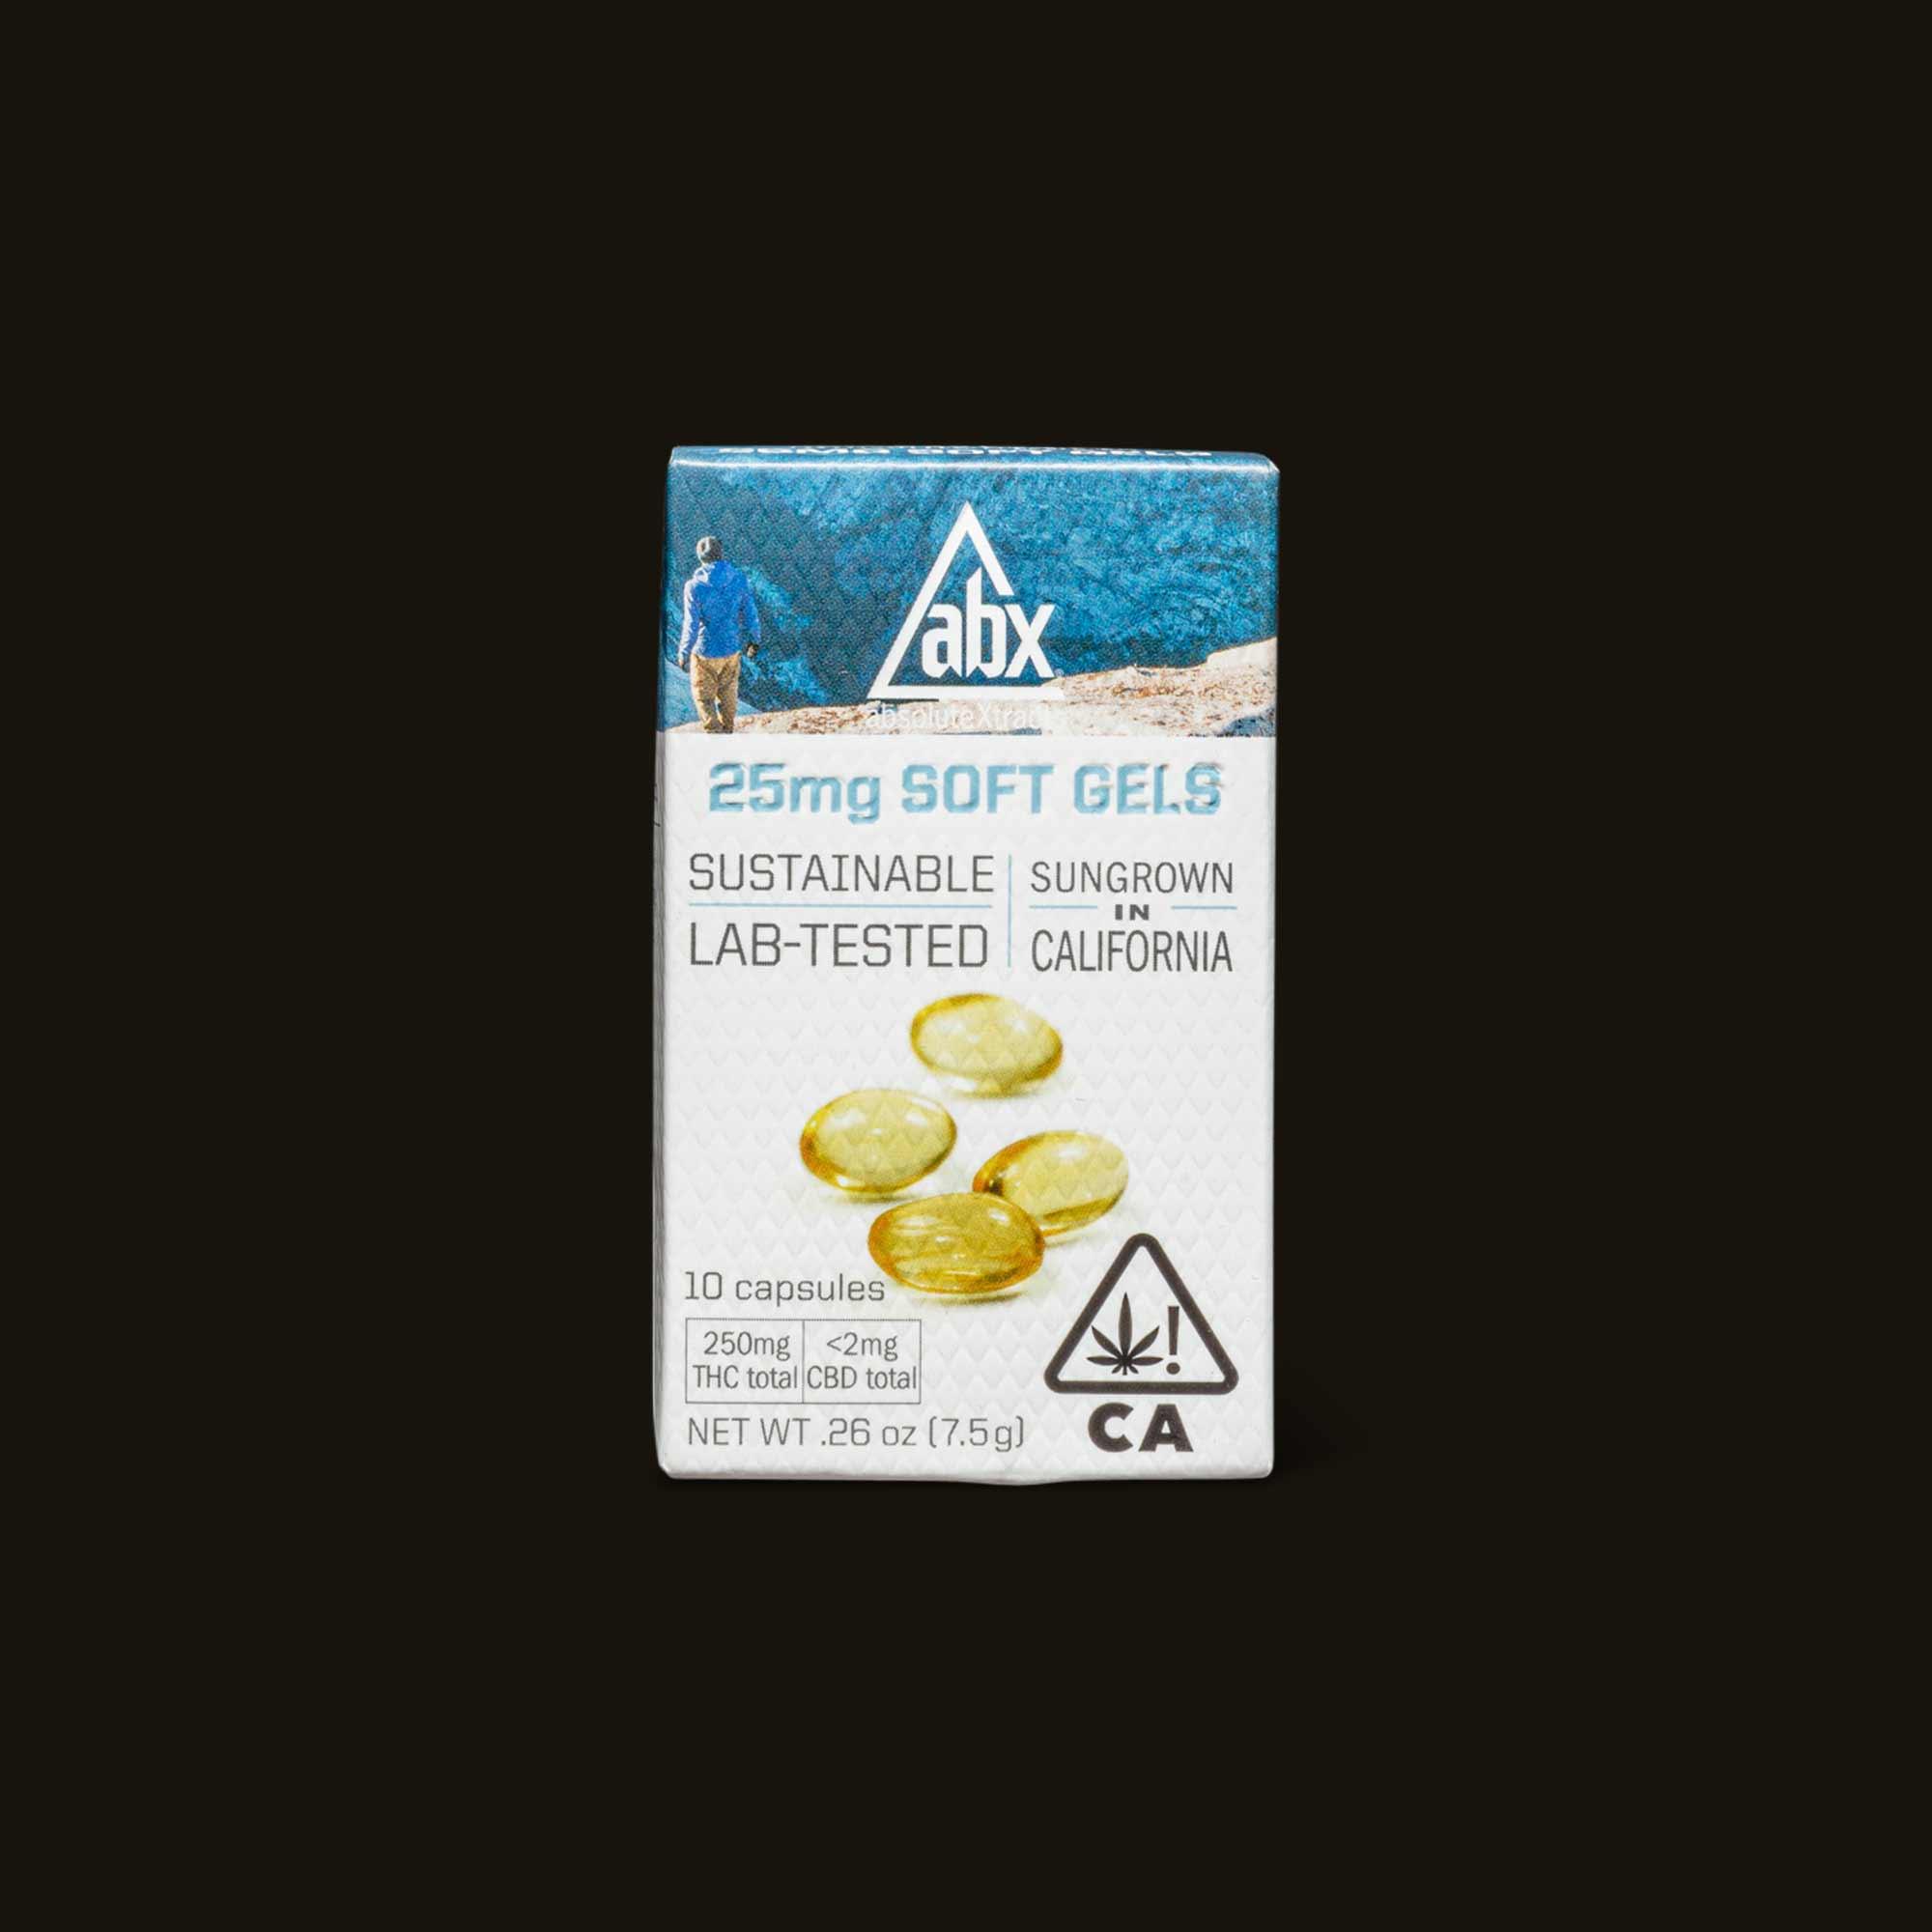 25mg THC Soft Gels - 10 capsules (250mg THC)